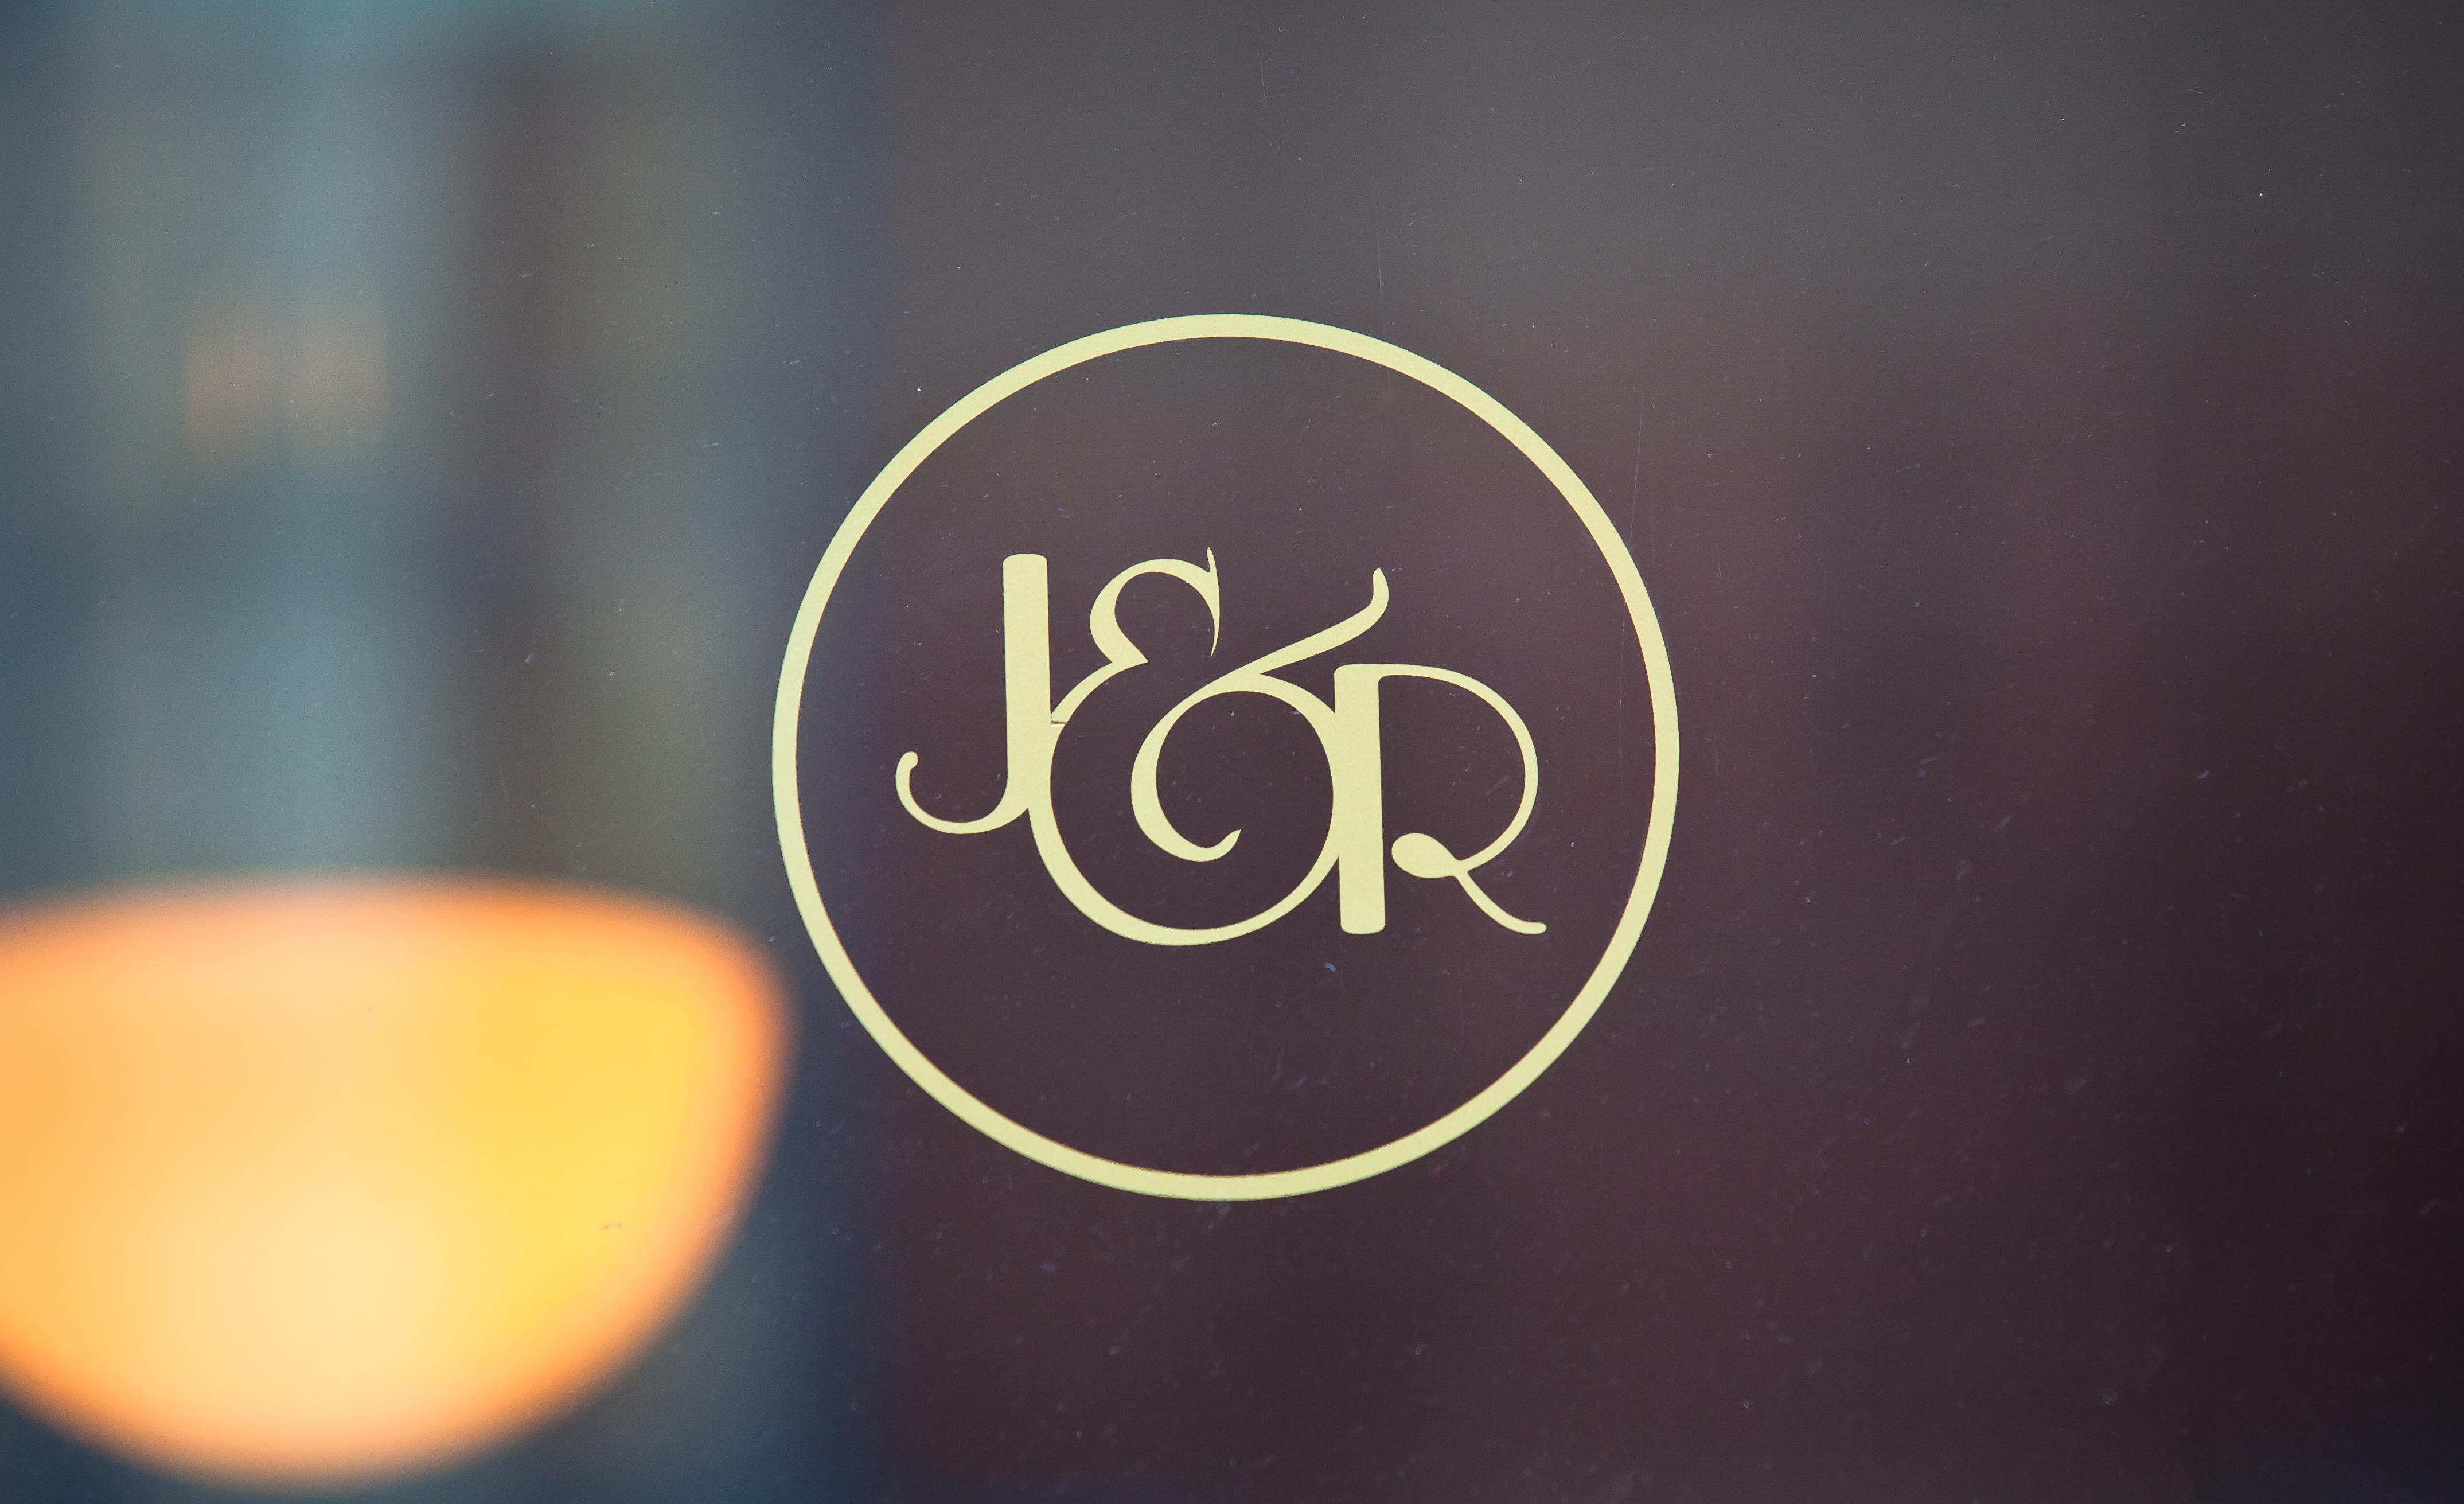 J&R Grimsmo